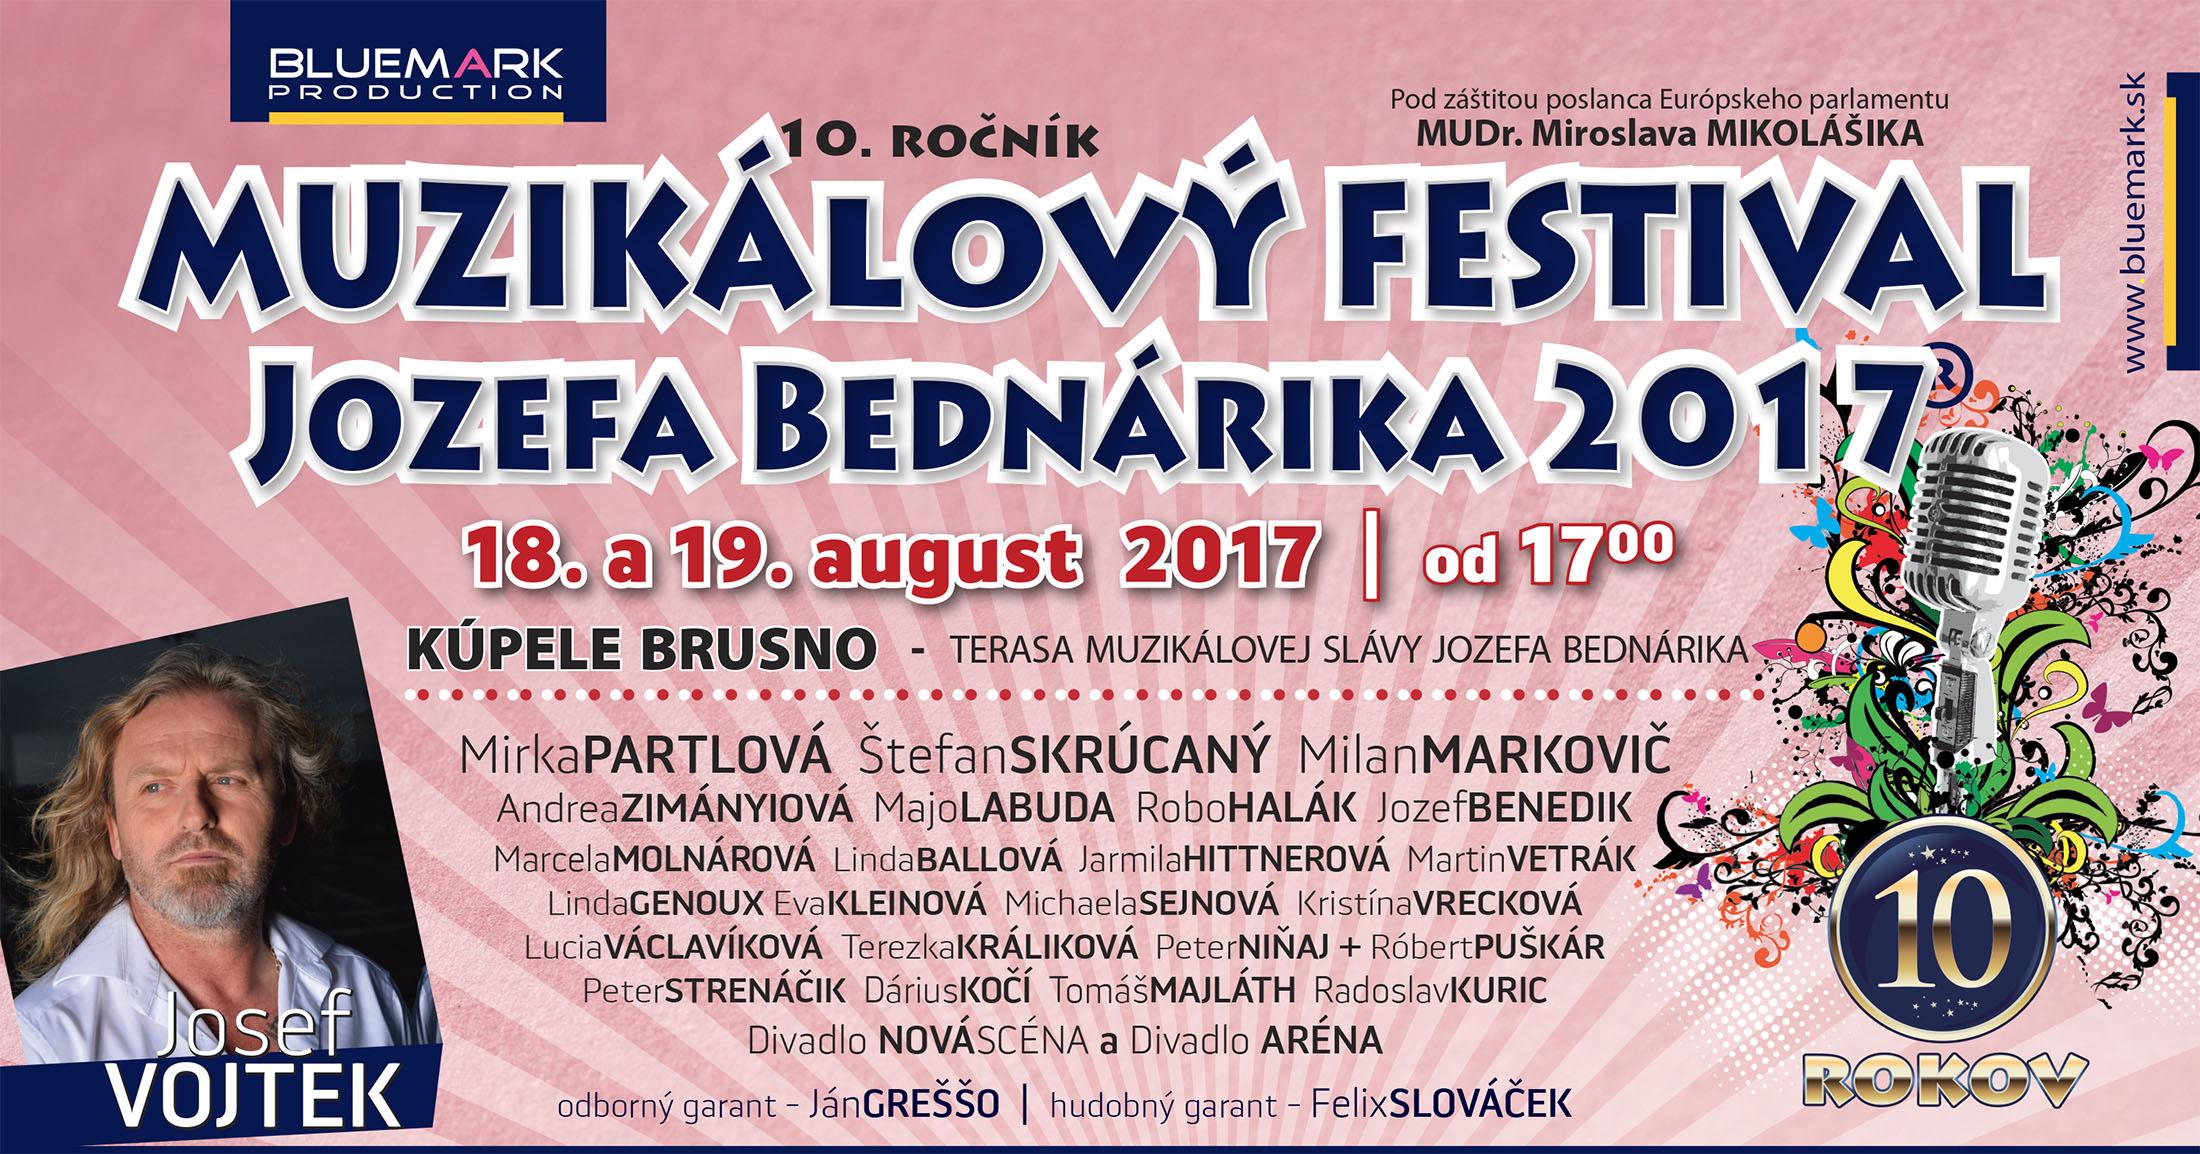 muzikalovy-festival-bednarika-plagat-2017